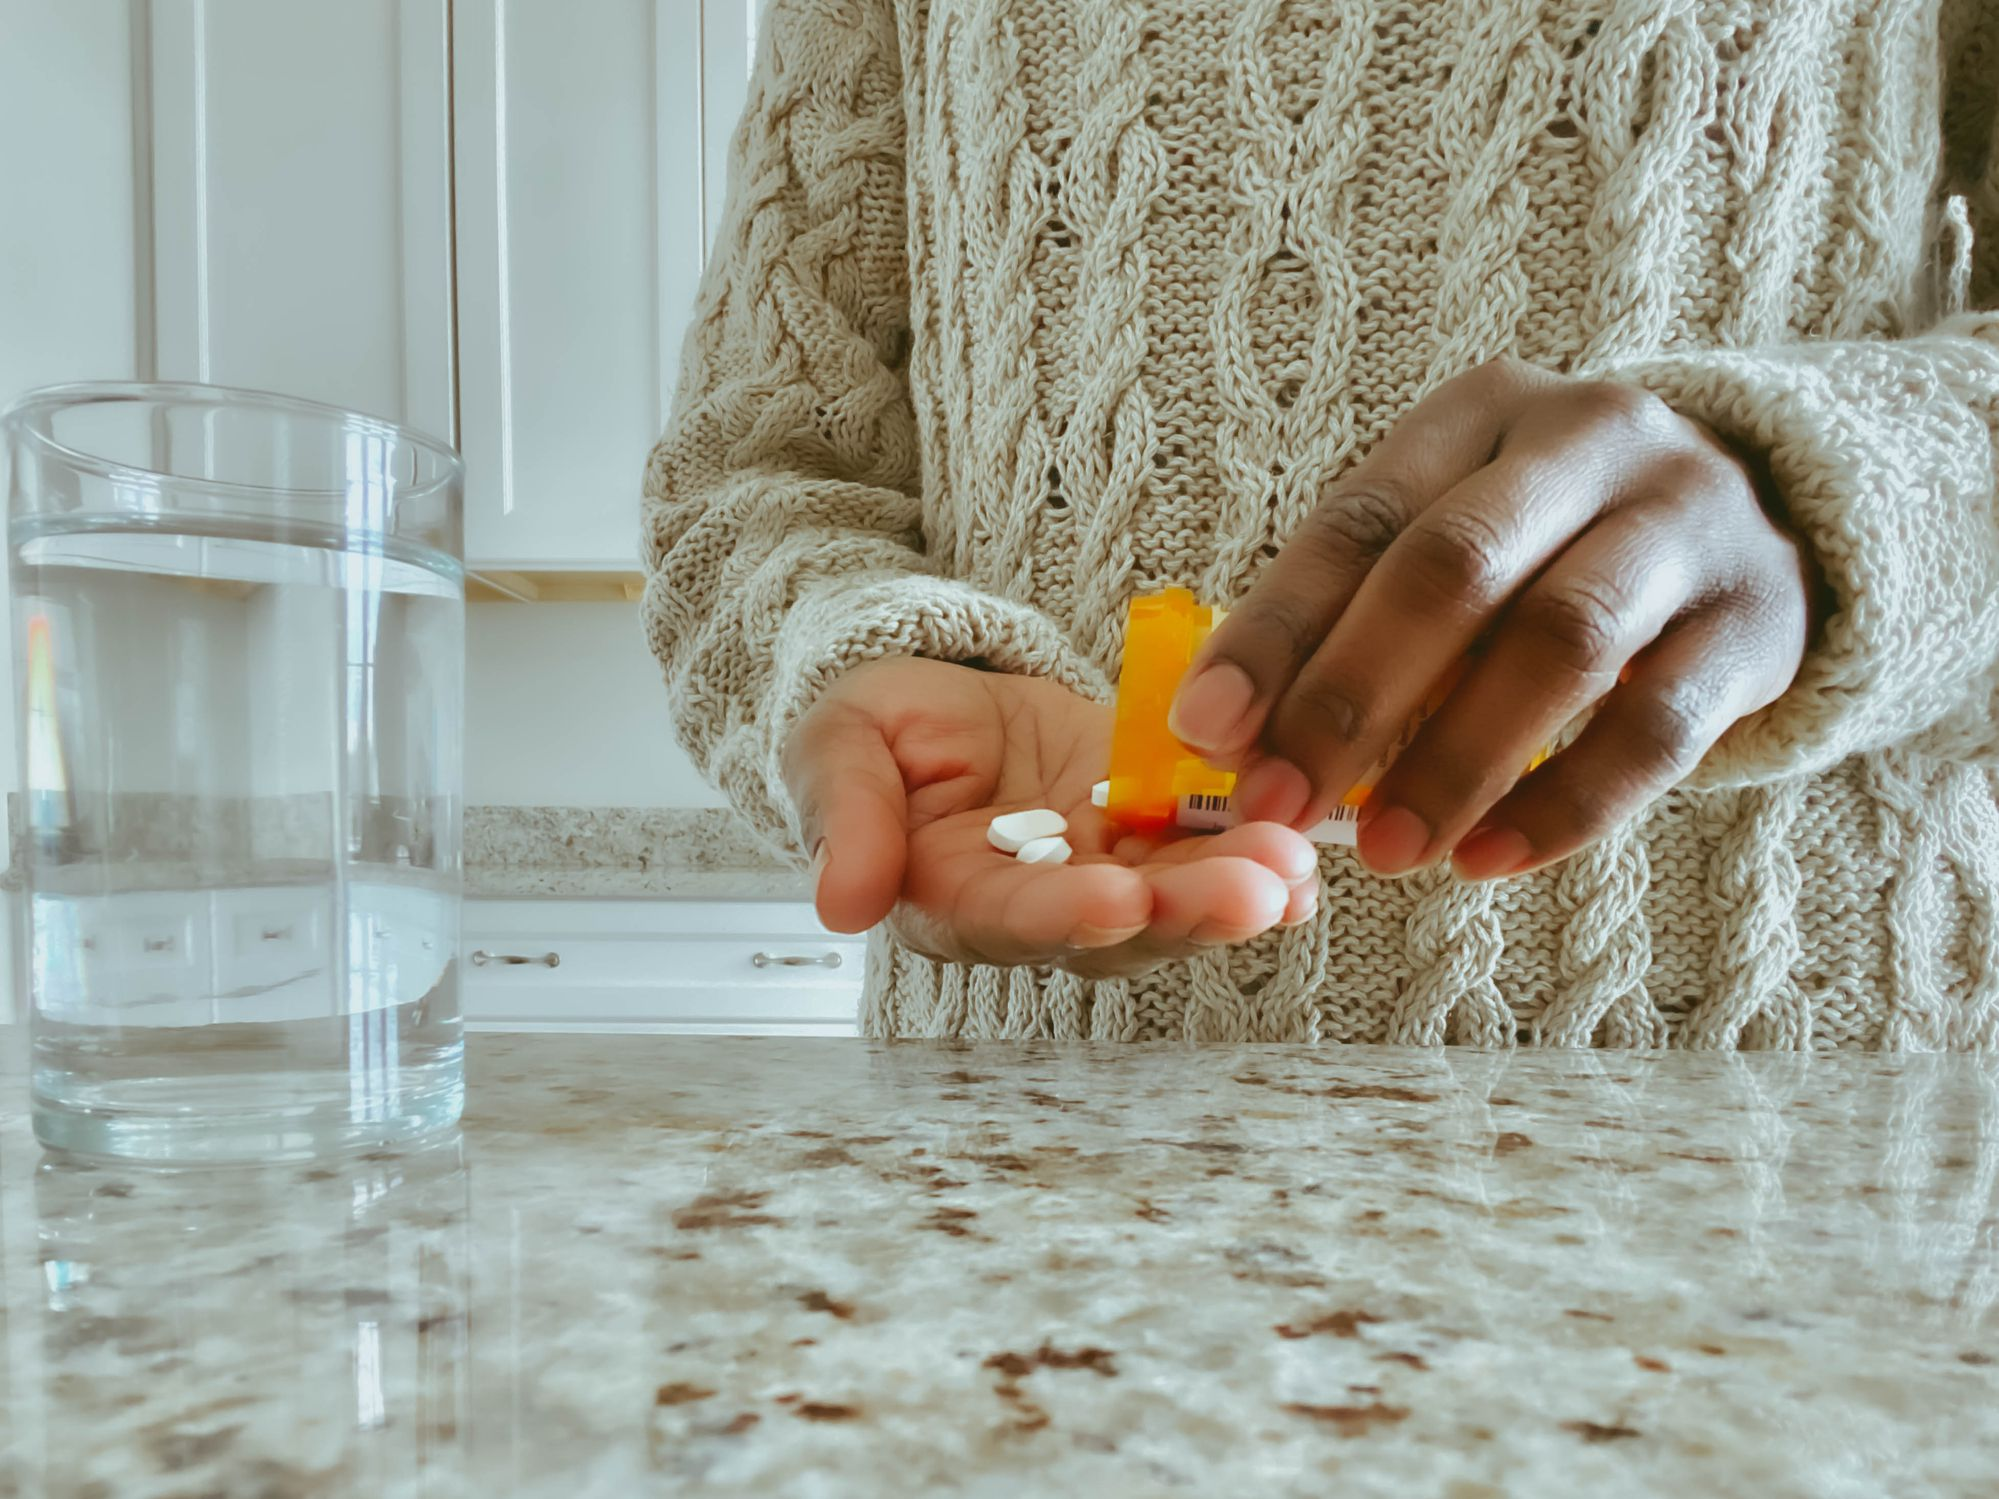 Researchers Identify Melatonin as Possible COVID-19 Treatment